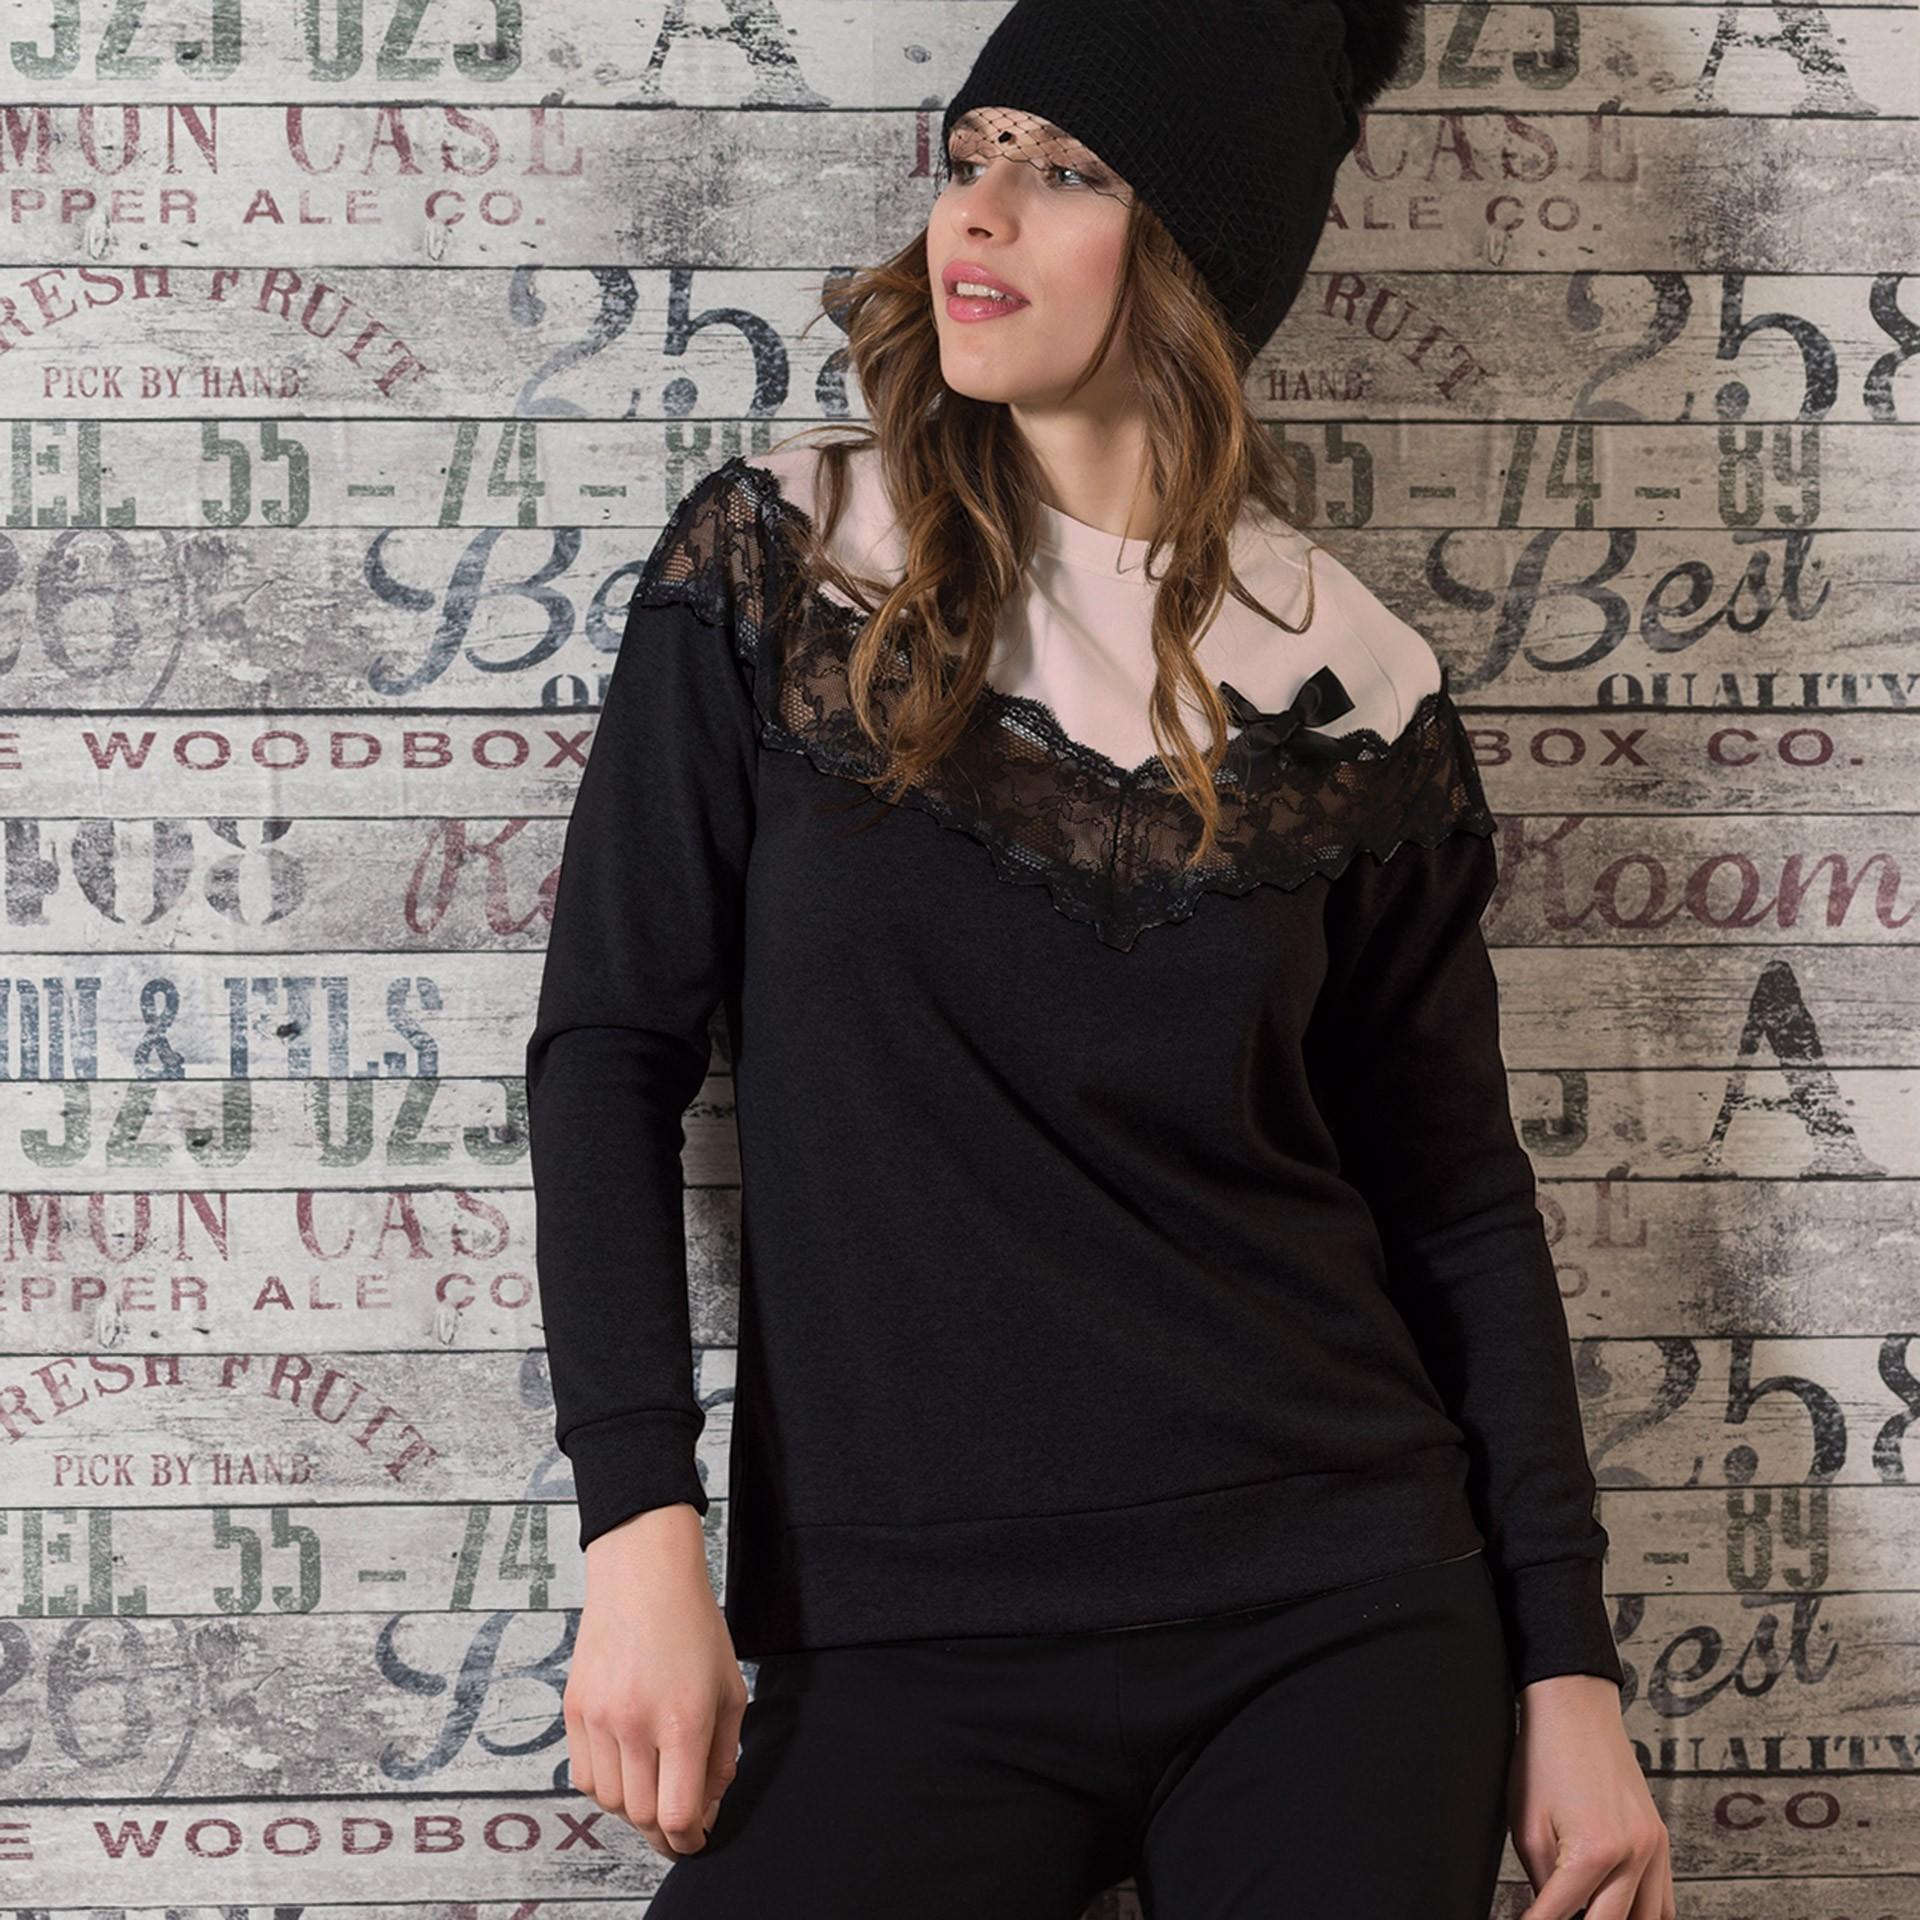 11aa387c6bda Snelly γυναικεία χειμωνιάτικη πυτζάμα ροζ-μαύρη μπλούζα με δαντέλα και  μαύρο παντελόνι 64978